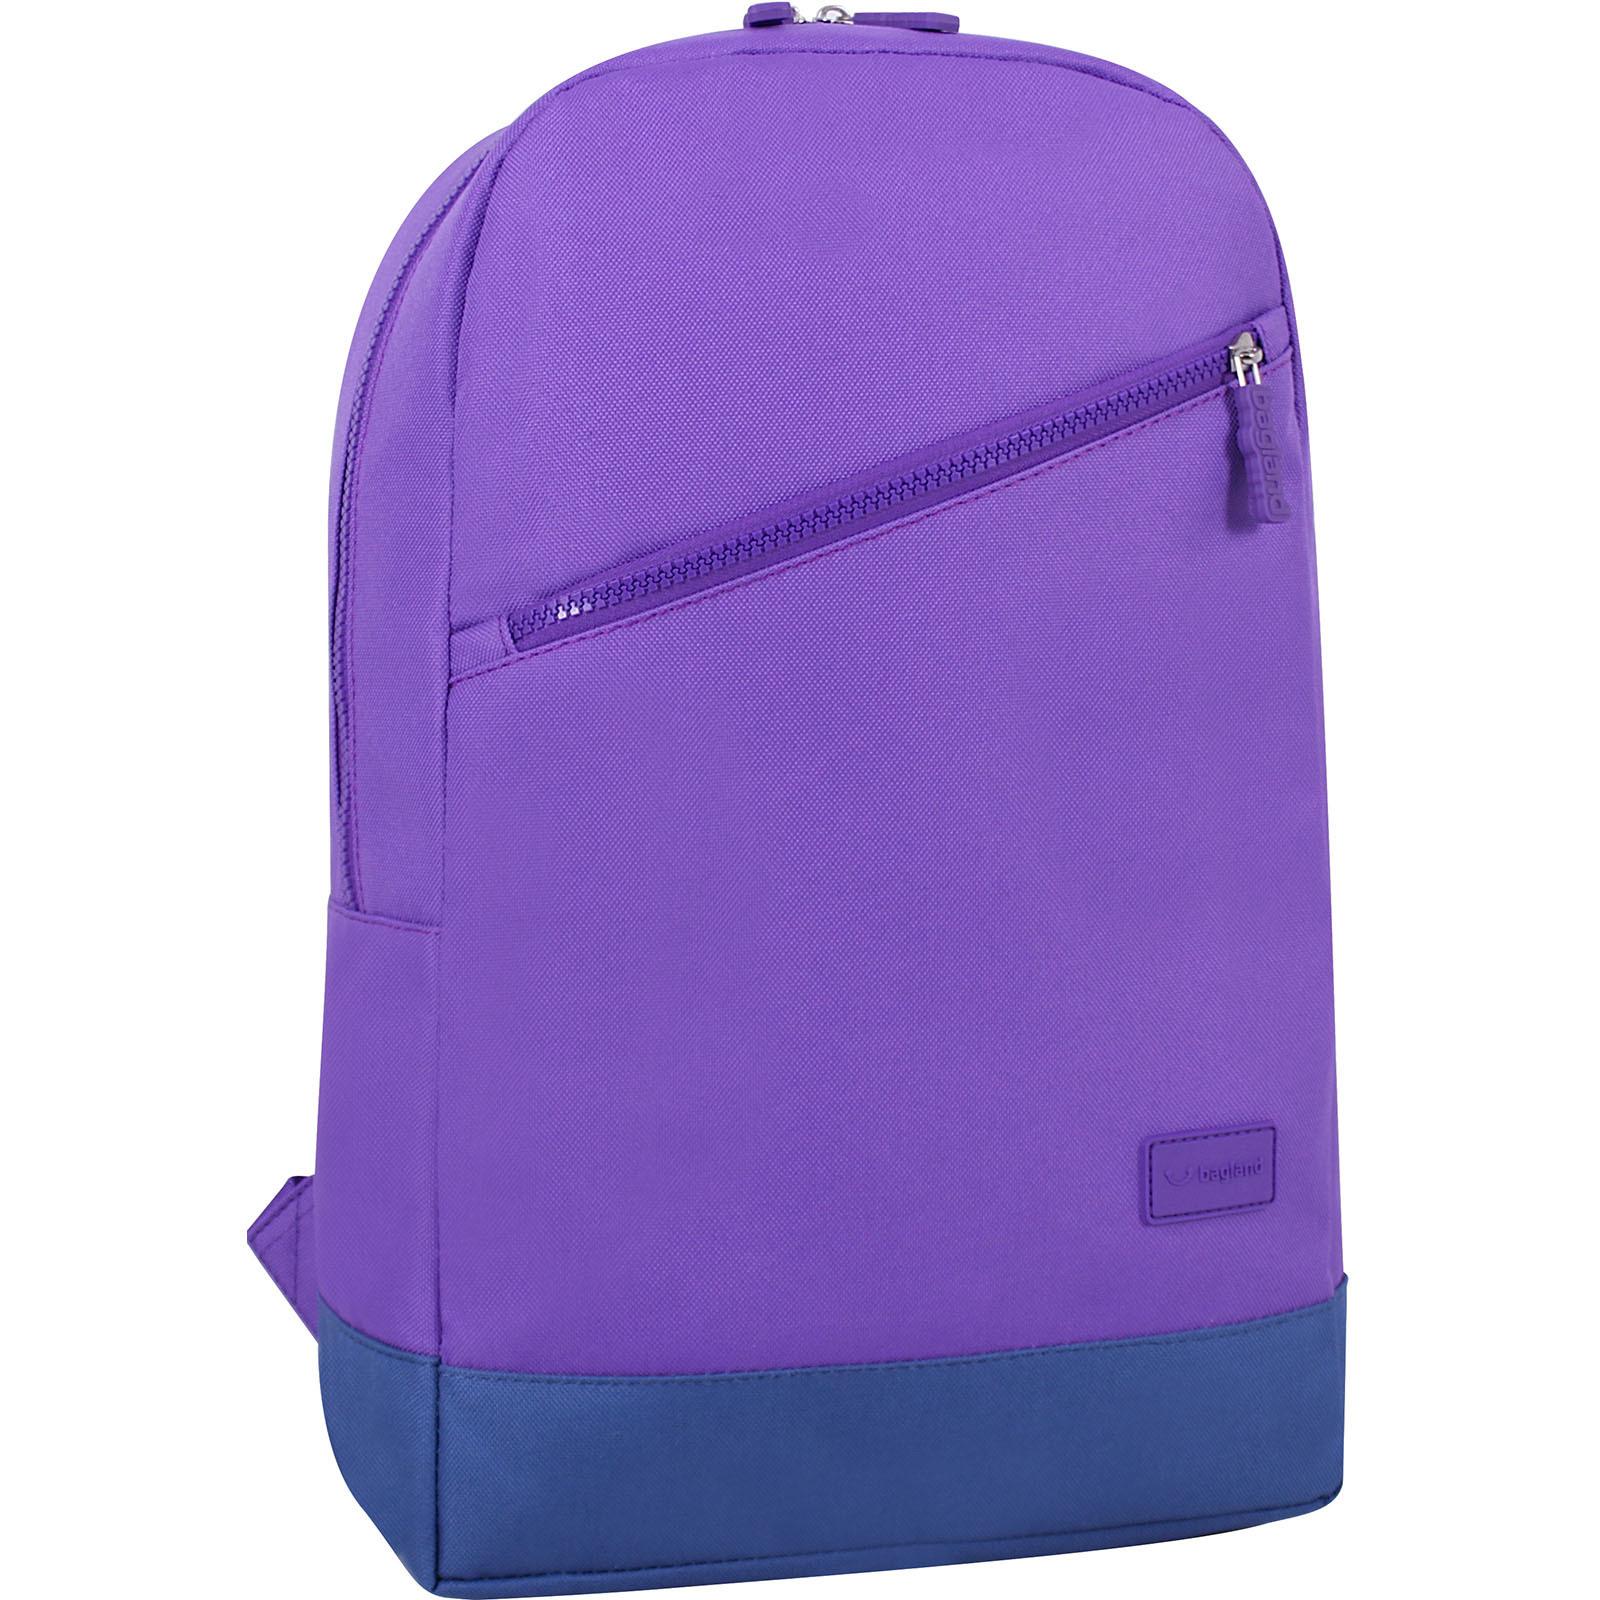 Городские рюкзаки Рюкзак Bagland Amber 15 л. фиолетовый/синий (0010466) IMG_6784.JPG